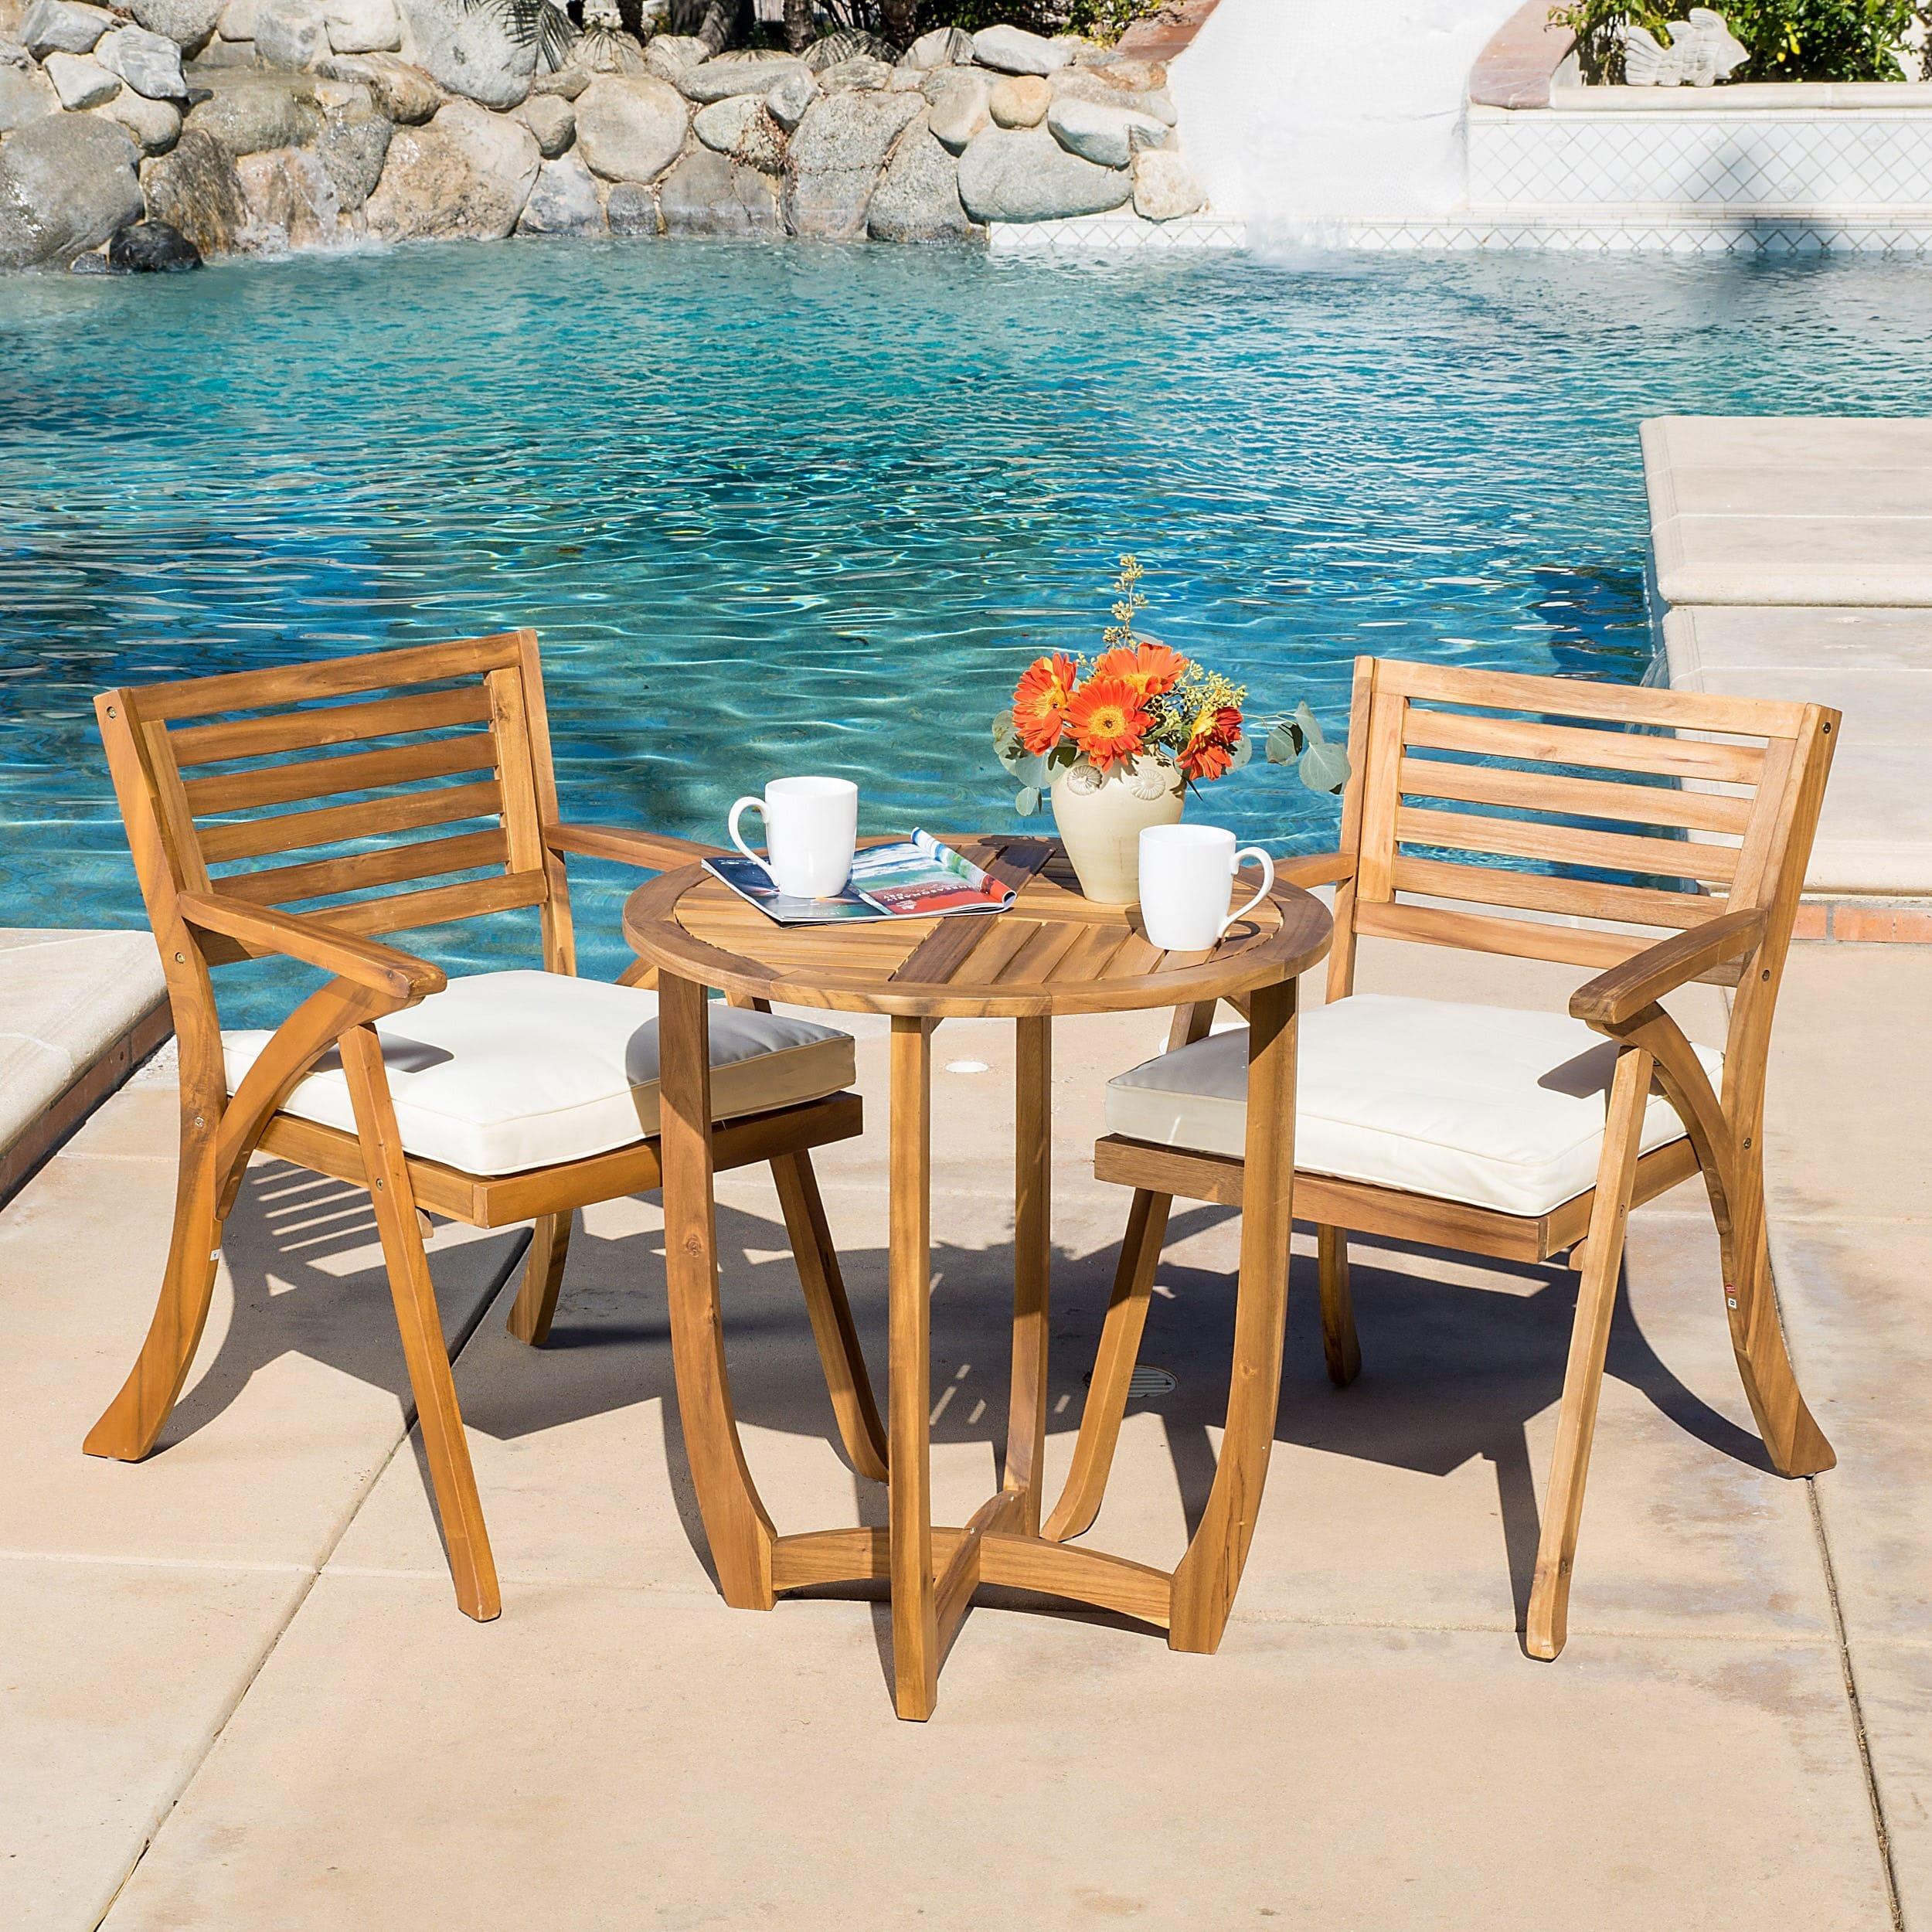 Buy outdoor bistro sets online at overstock our best patio furniture deals